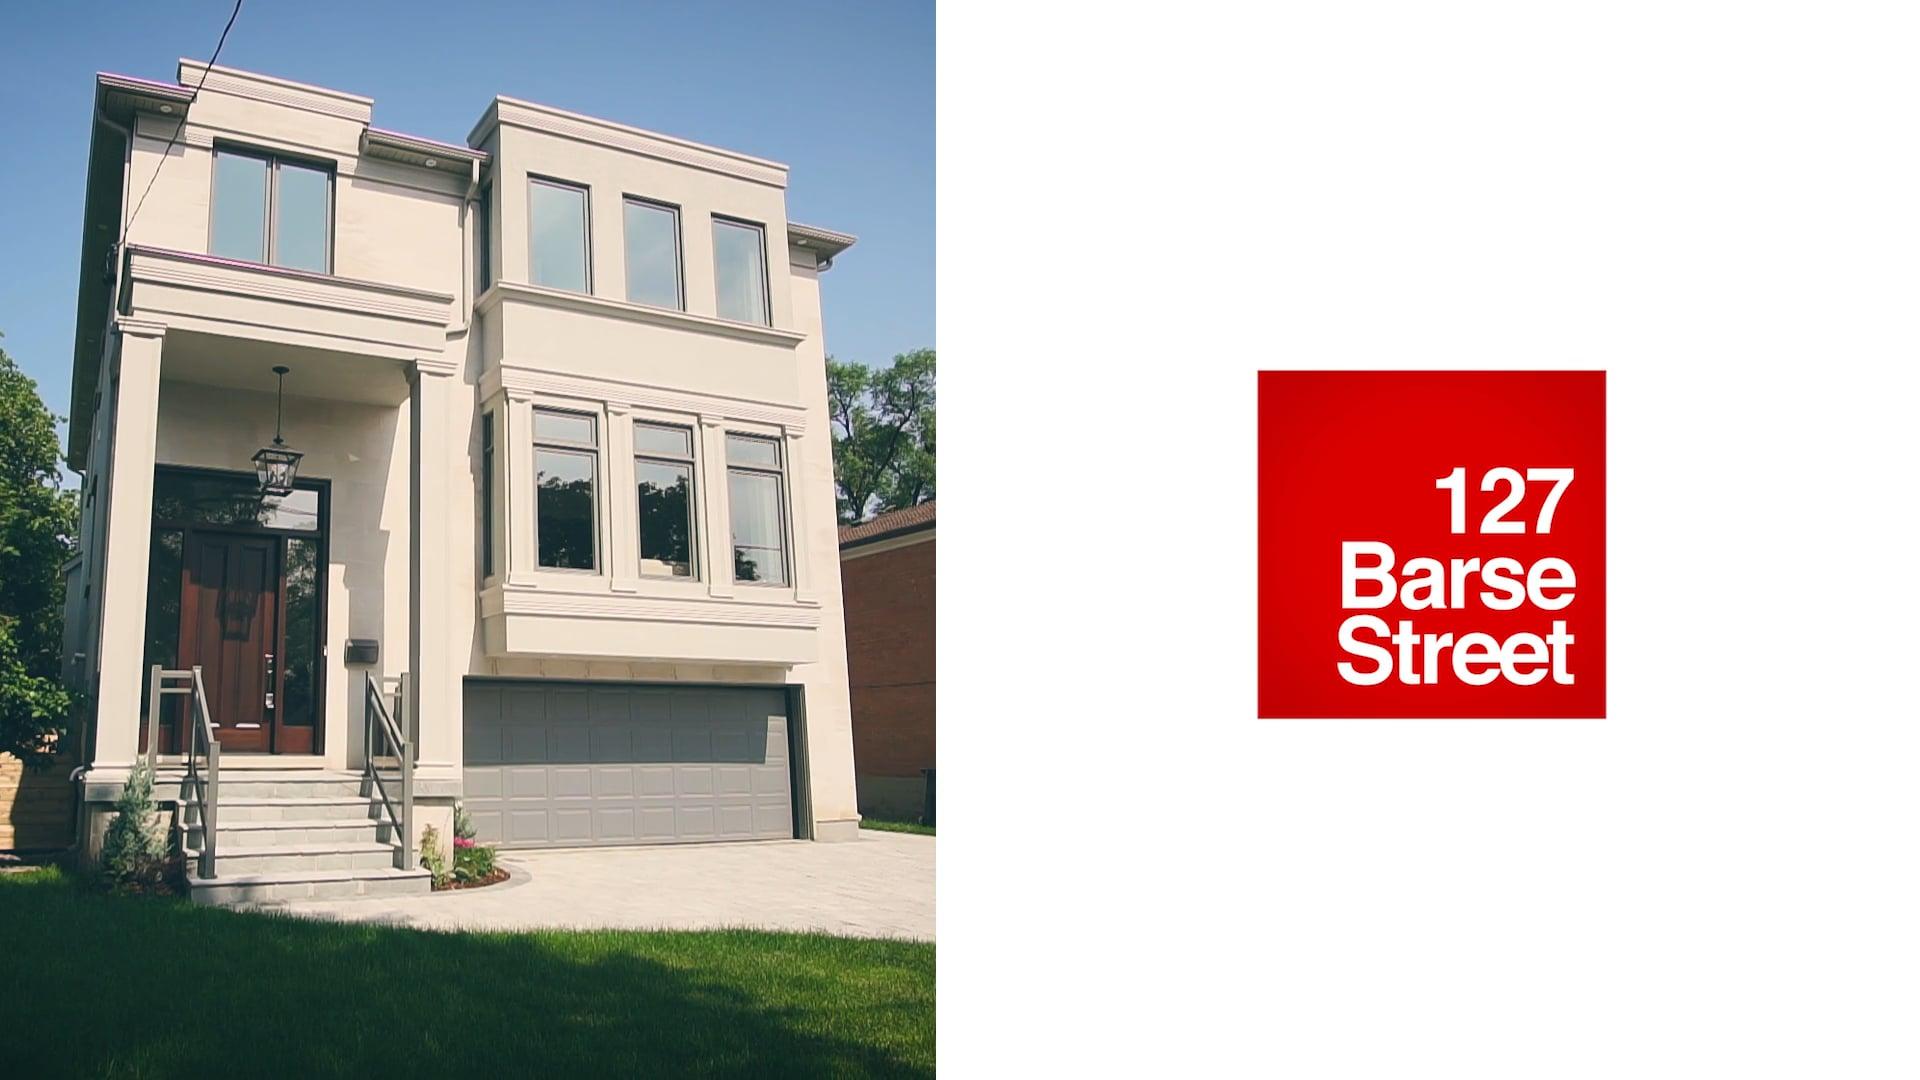 127 Barse Street